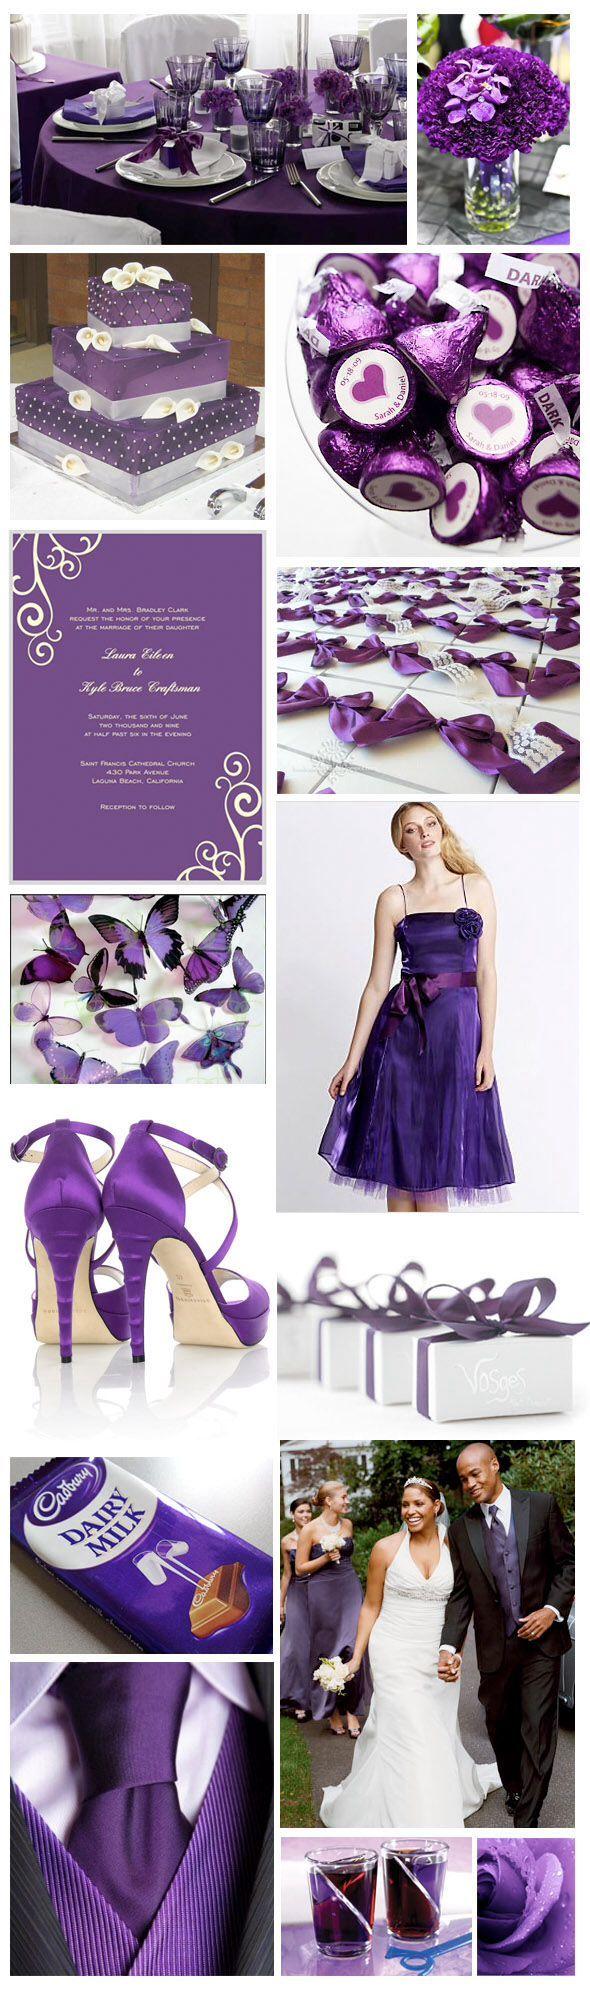 73 best Wedding images on Pinterest | Wedding ideas, Bridesmaids and ...